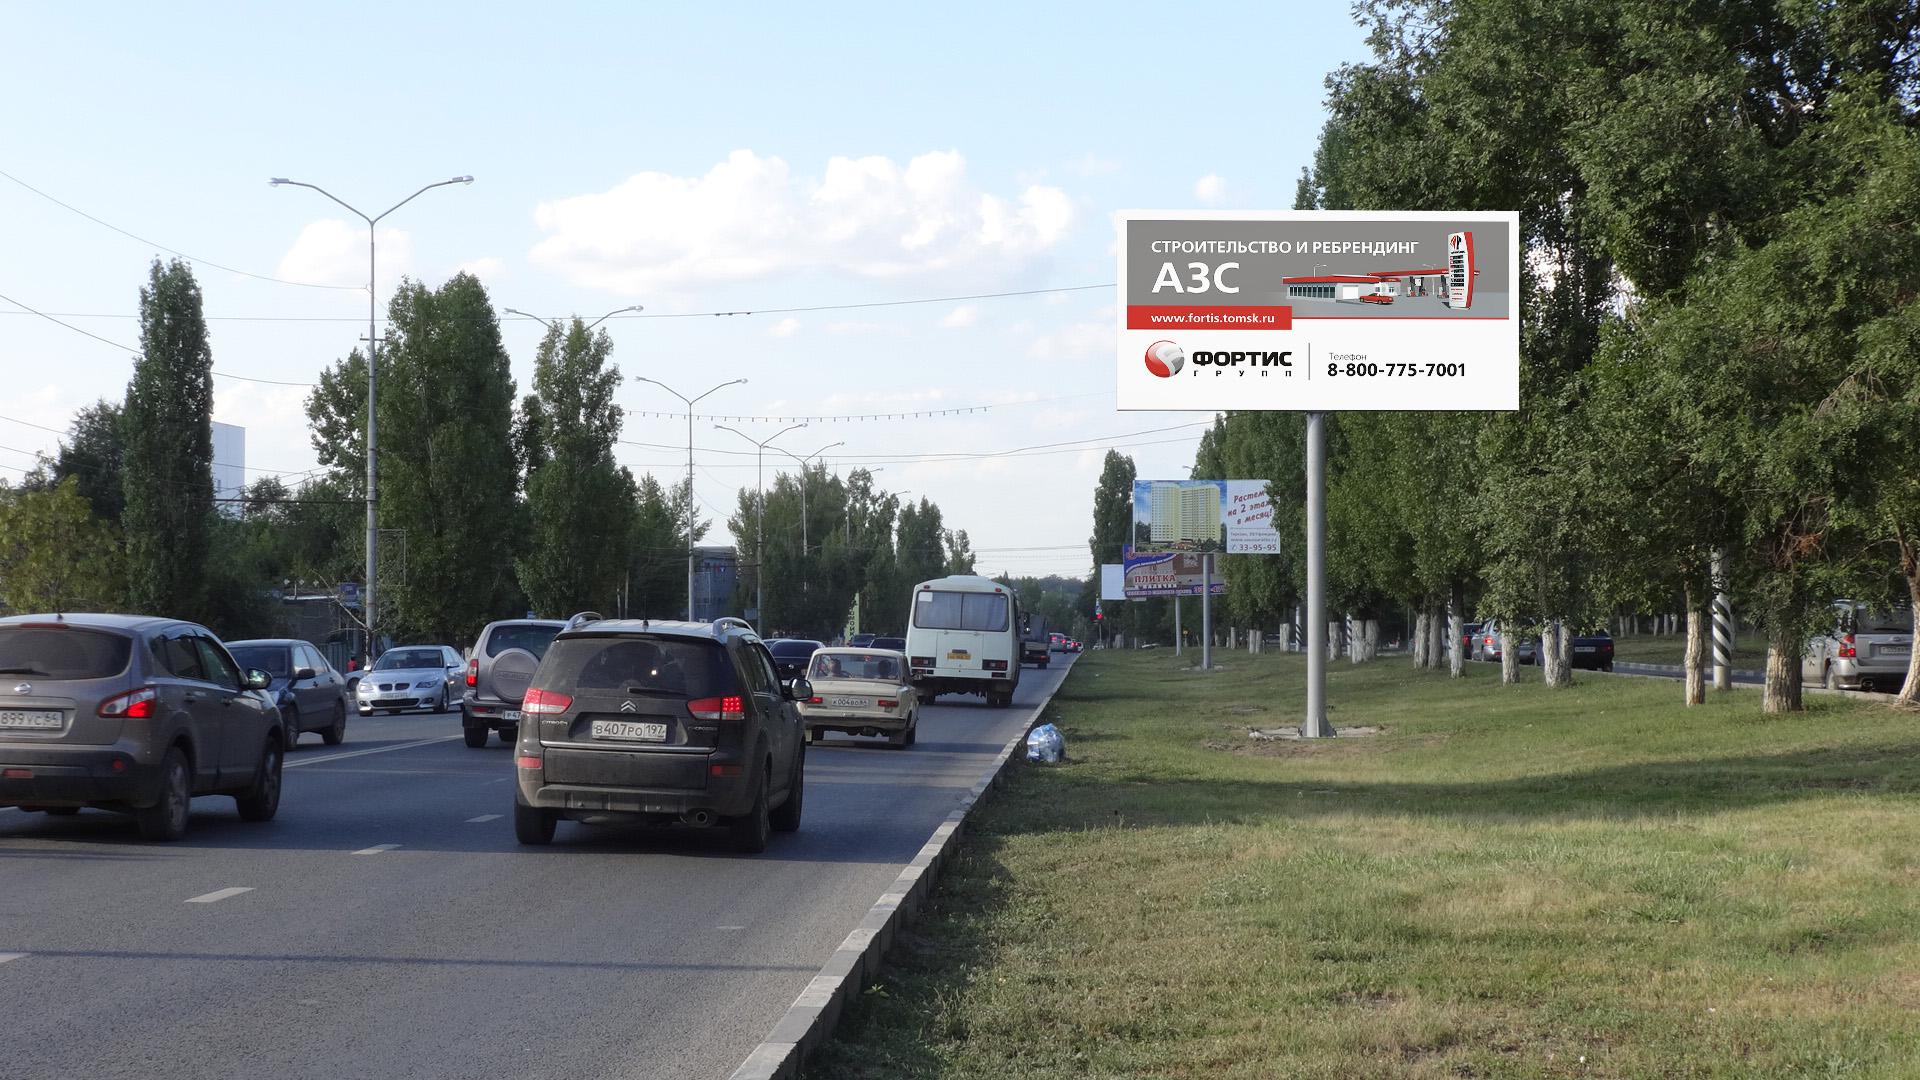 пр-т Строителей, 54 (между ул. Академика Антонова и ул.Чемодурова)